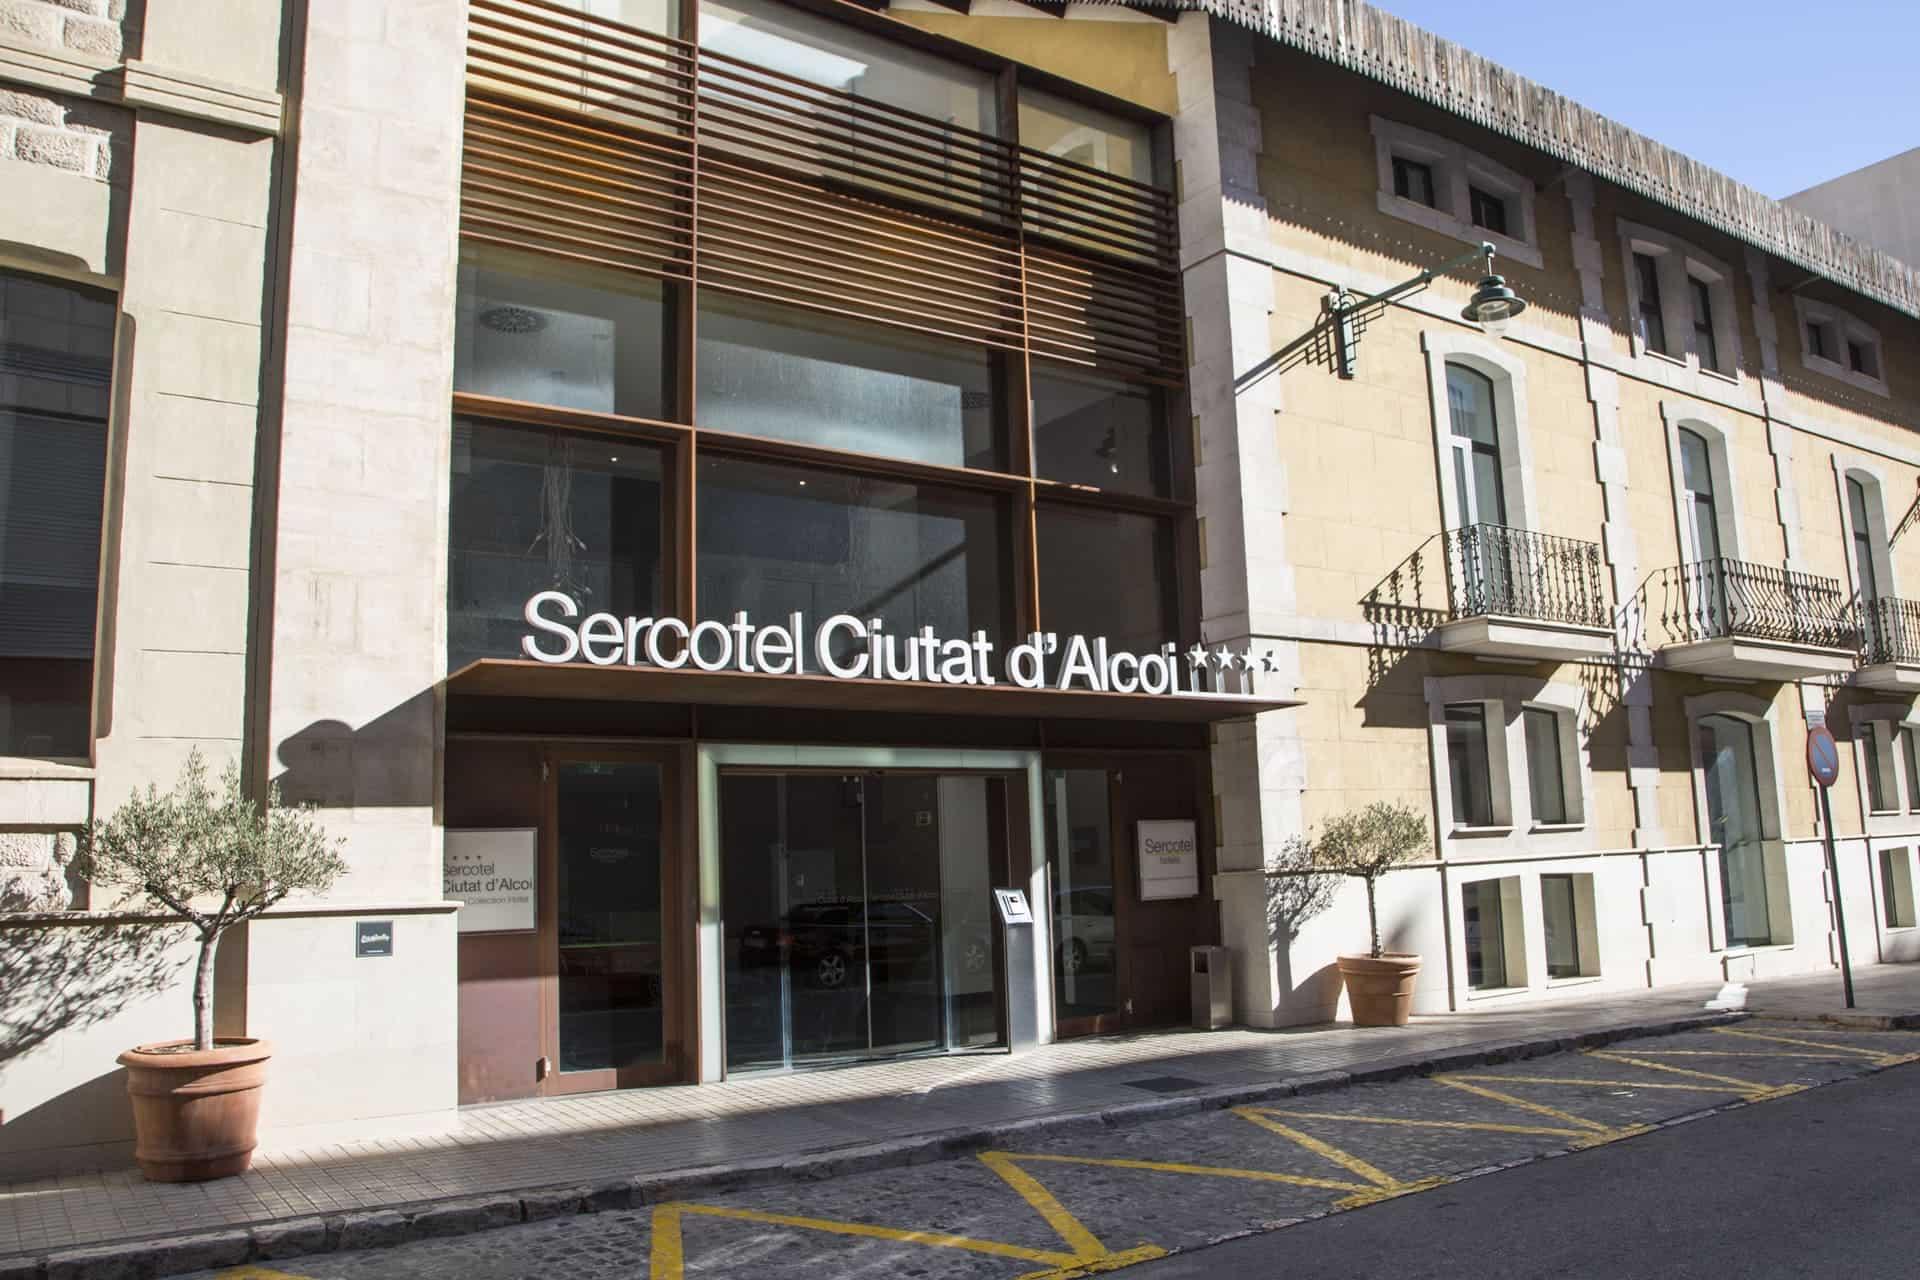 Sercotel Hotel Ciutat d'Alcoi